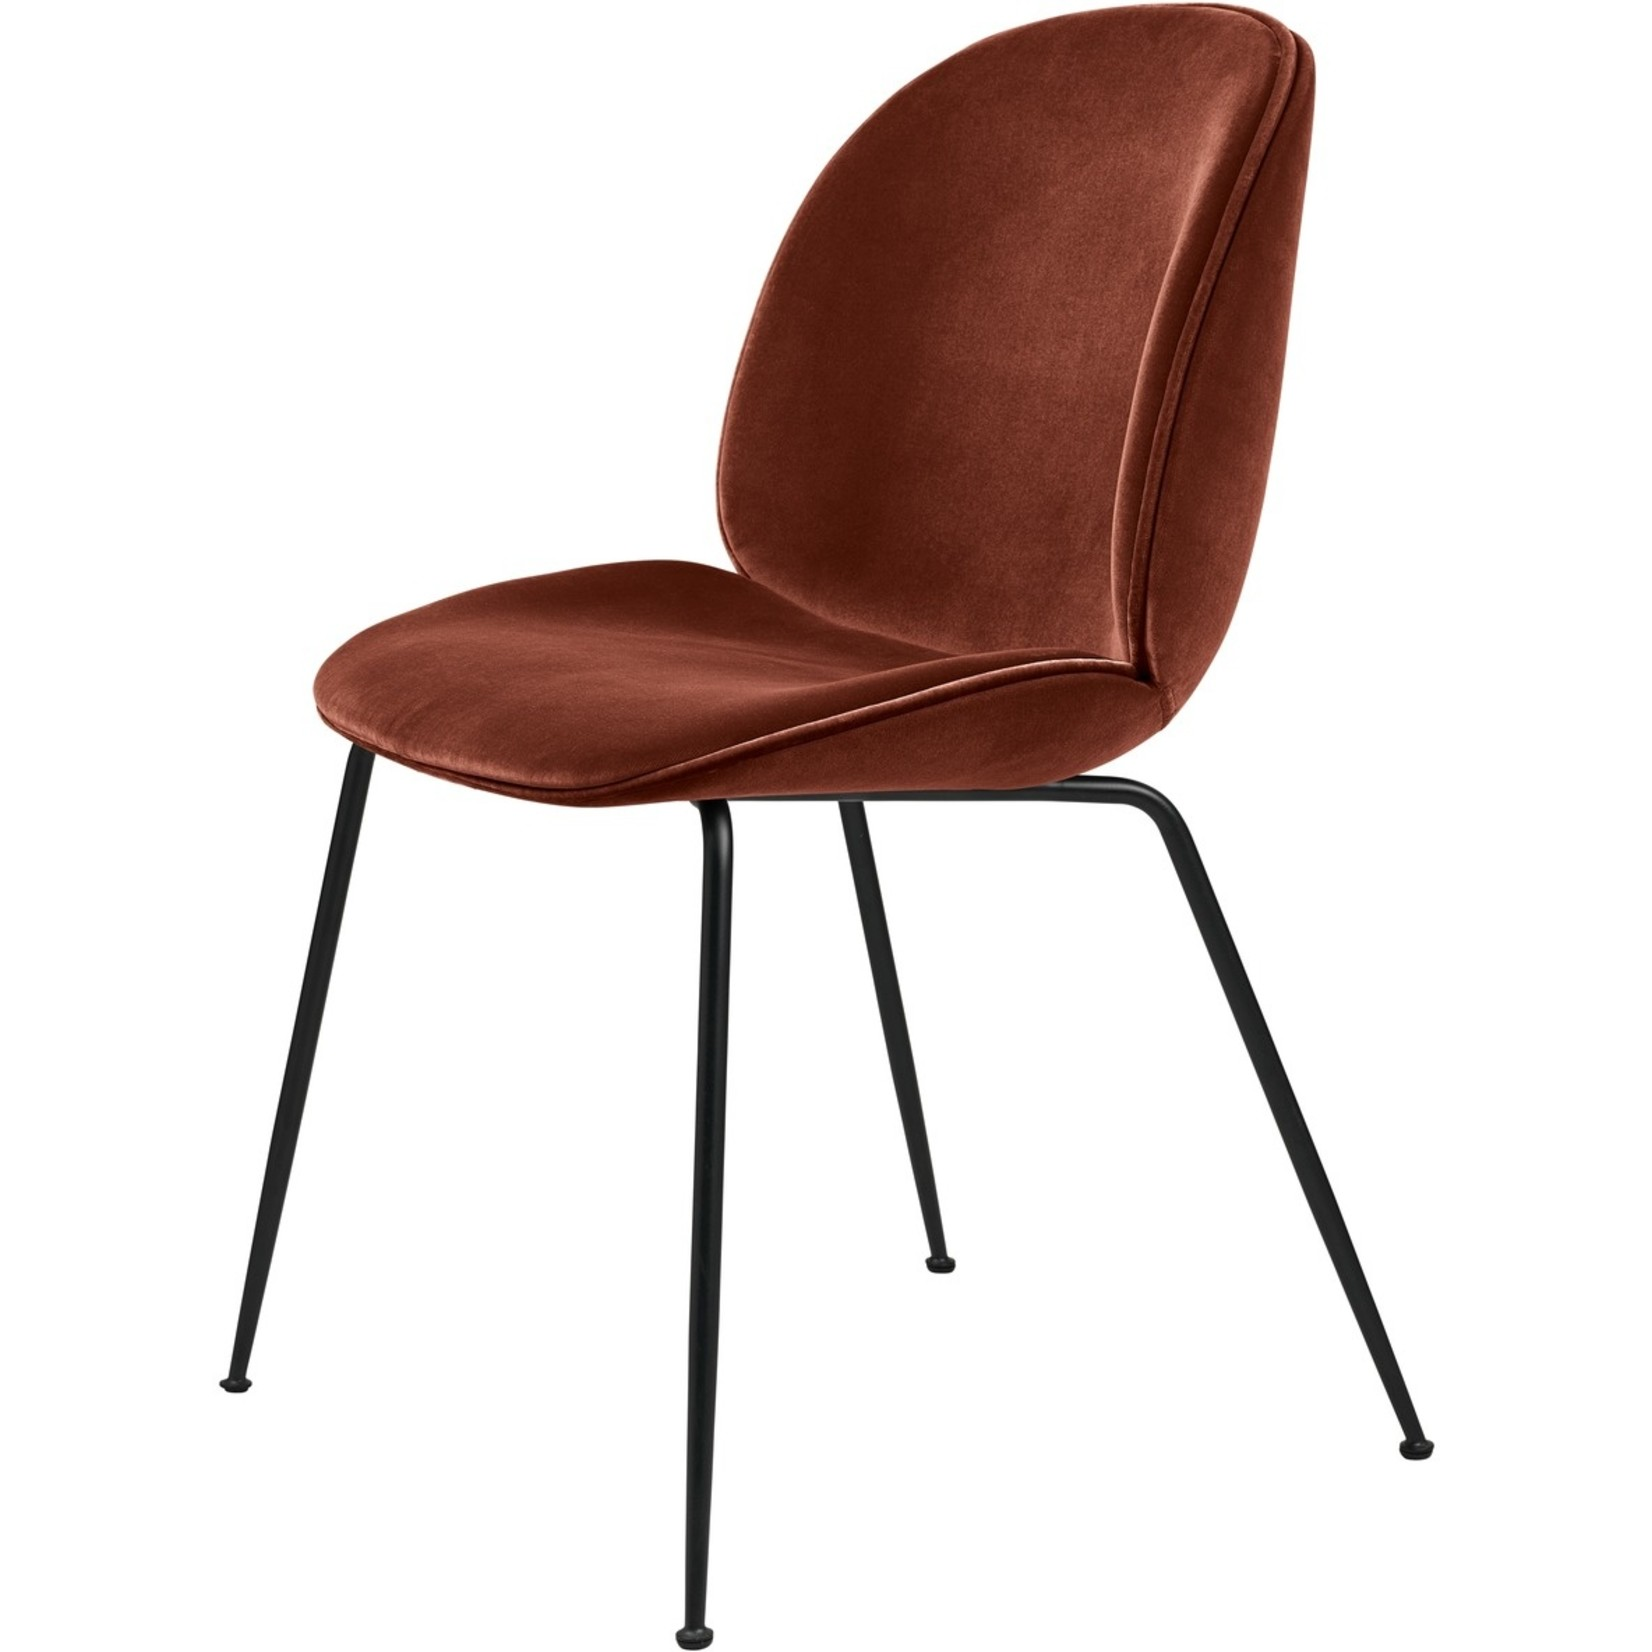 Gubi Beetle Dining Chair | Rusty Red & Black Matt Base